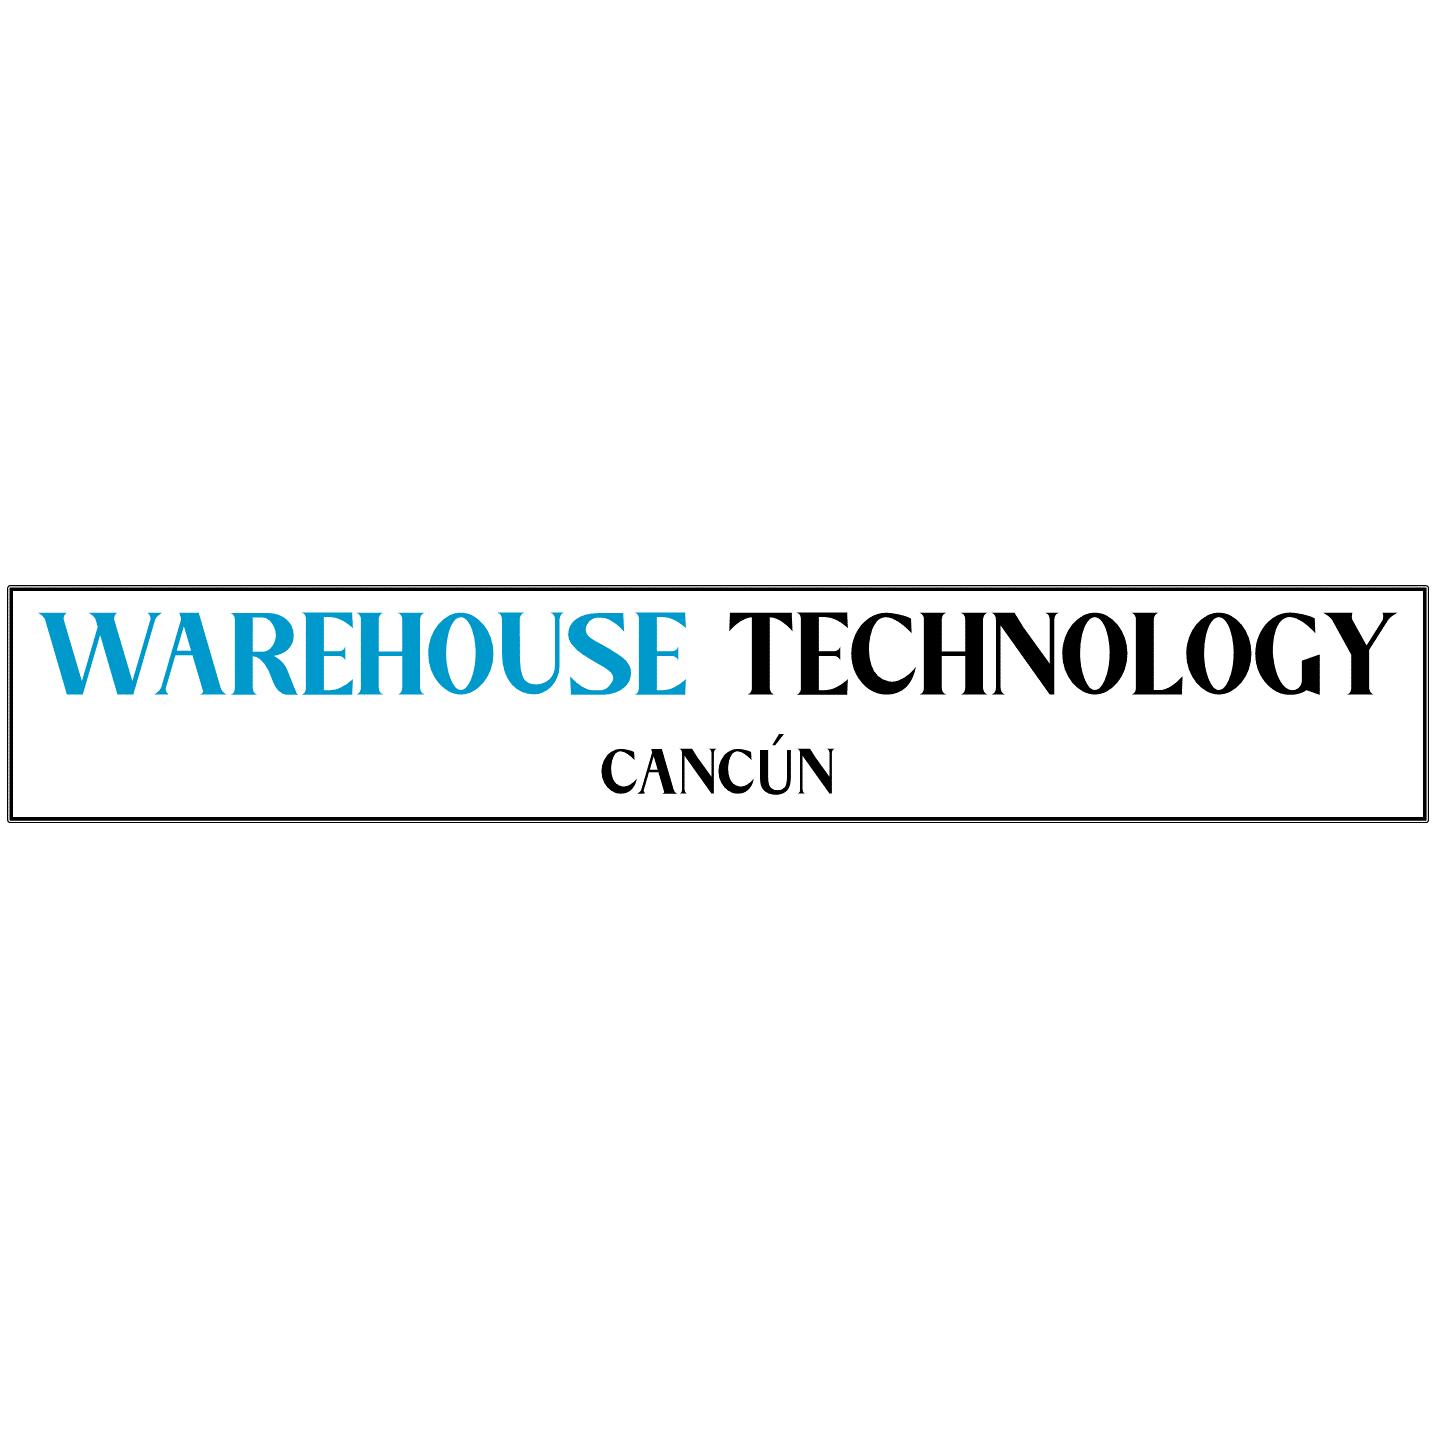 Warehouse Technology Cancún